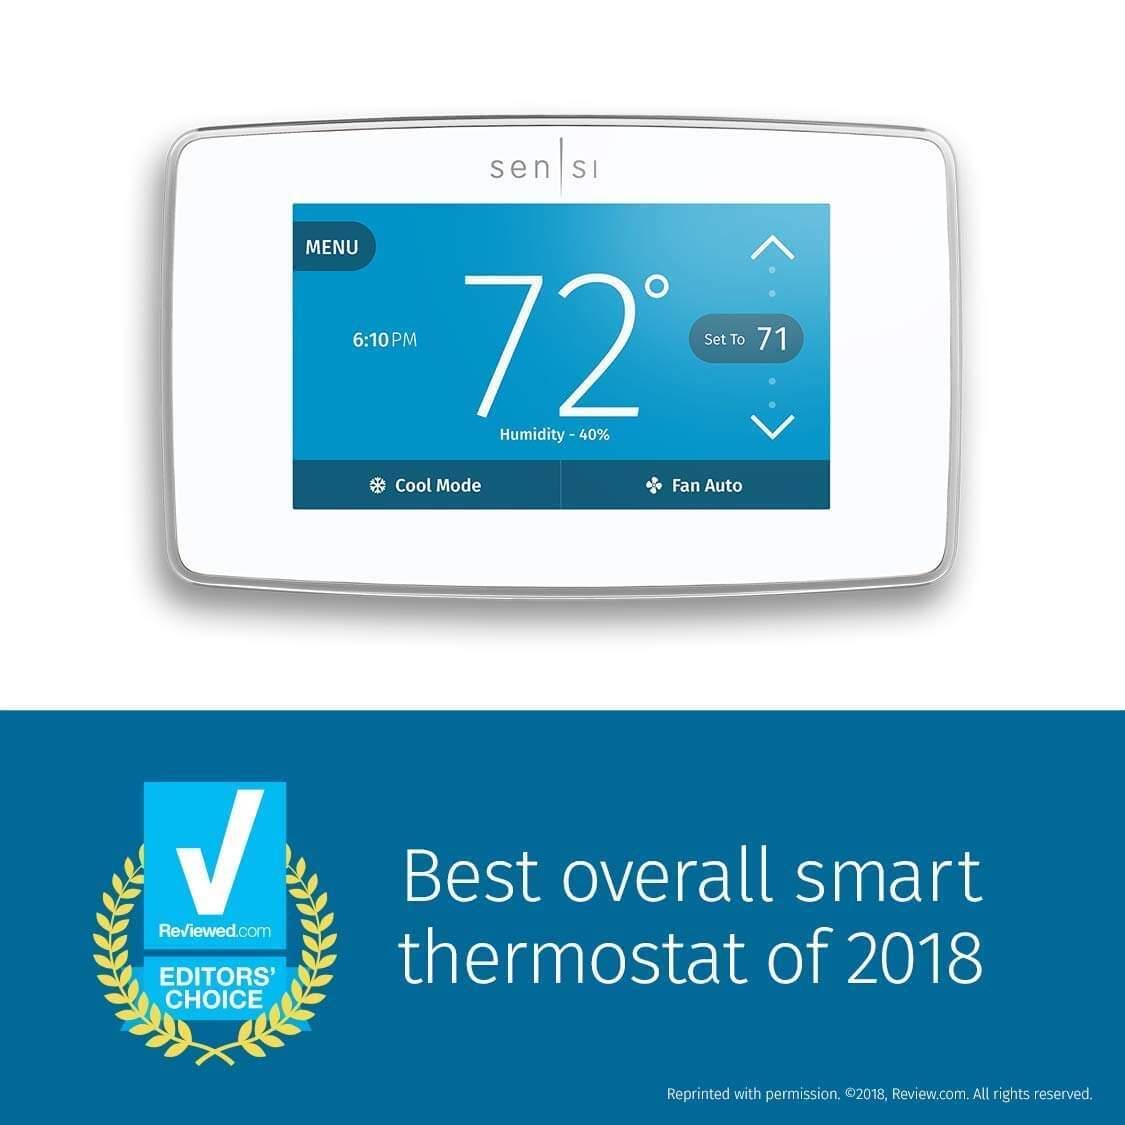 sensi thermostat review